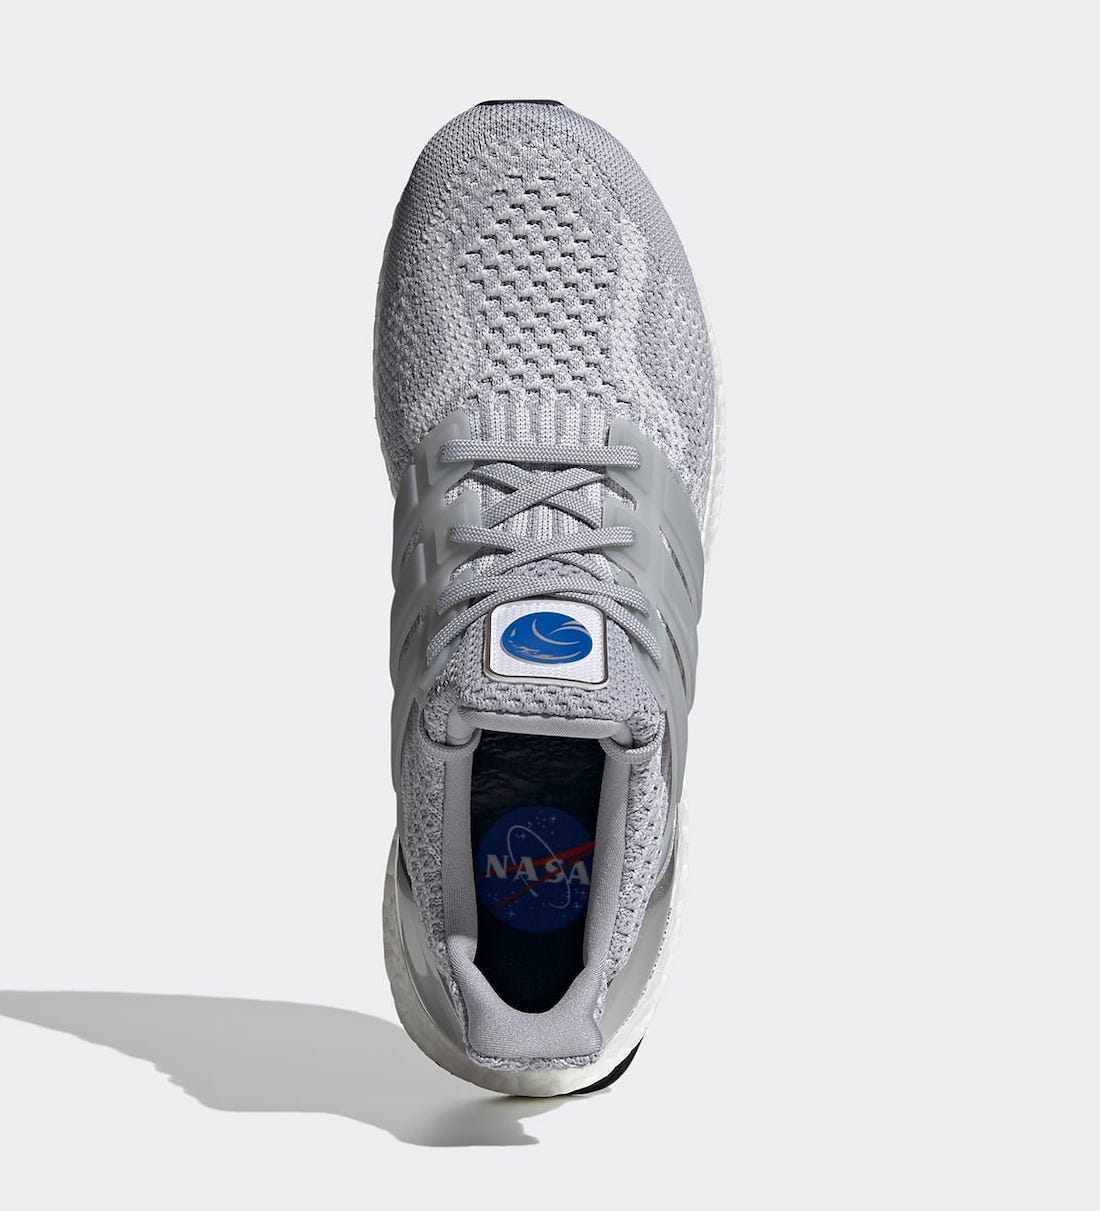 Pánské šedé tenisky a botasky NASA x adidas Ultra Boost DNA Halo Silver/Halo Silver-Dash Grey FX7972 nízké běžecké boty a obuv Adidas